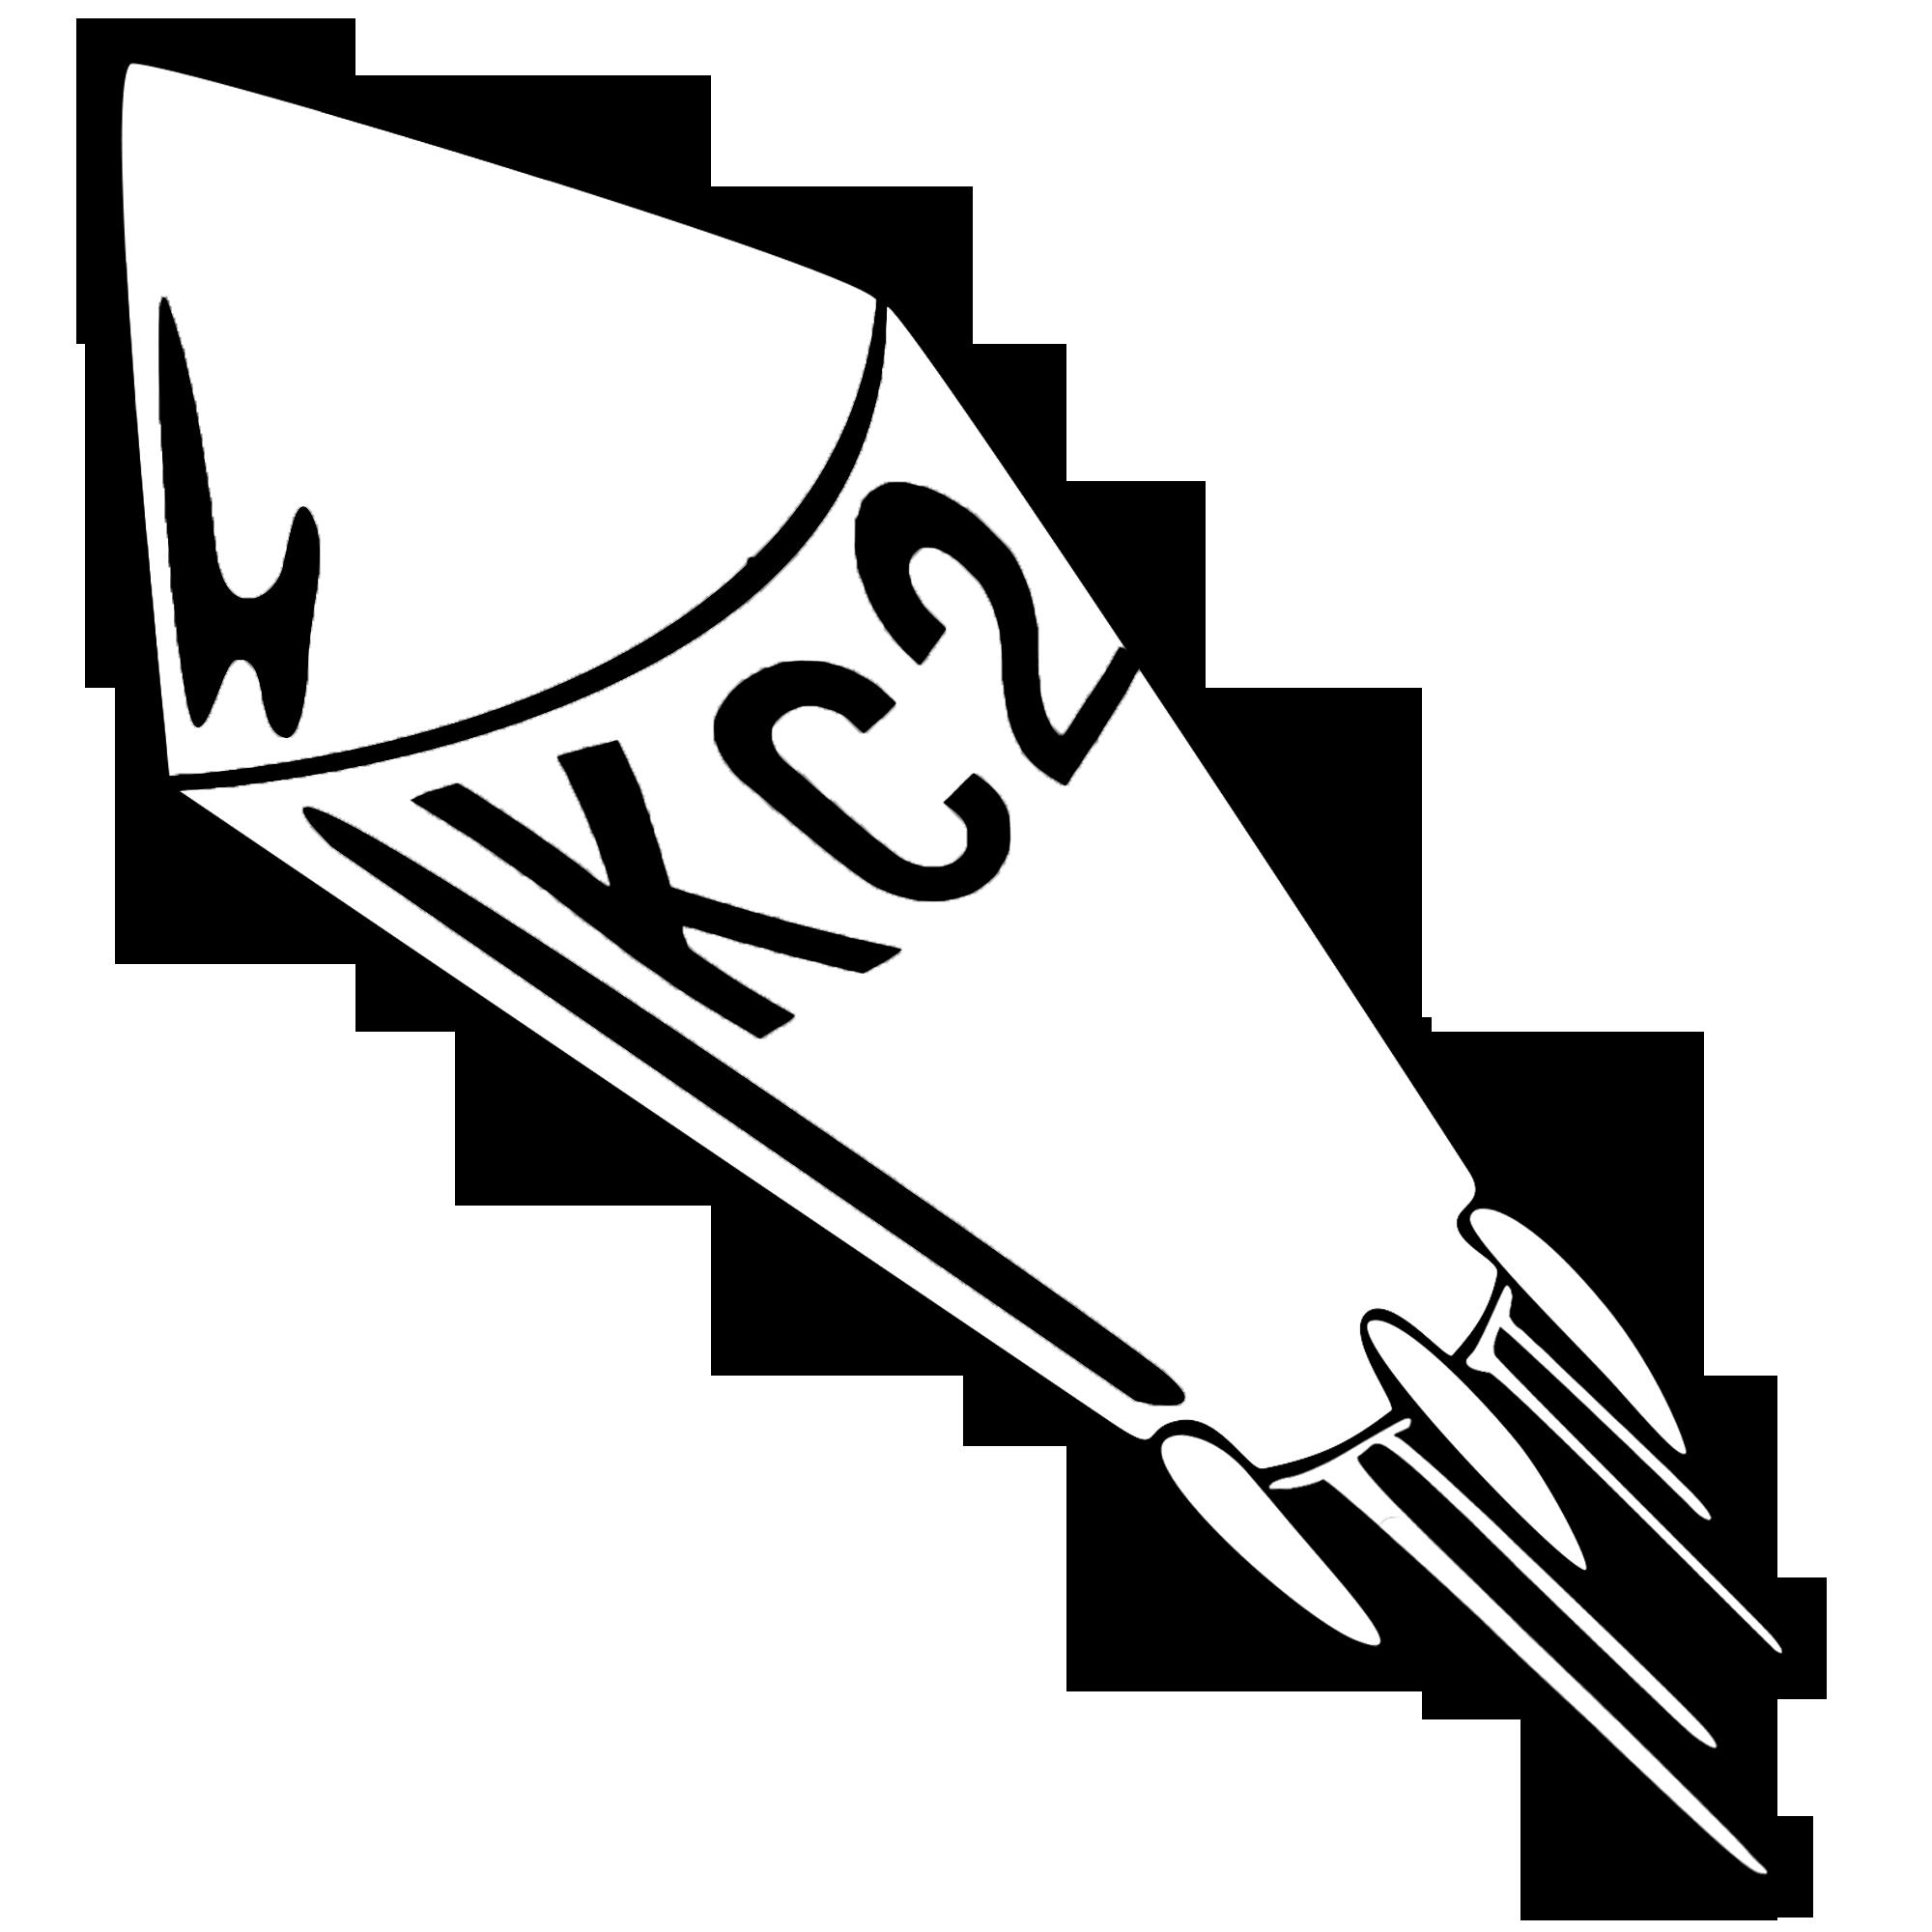 KC2 logo